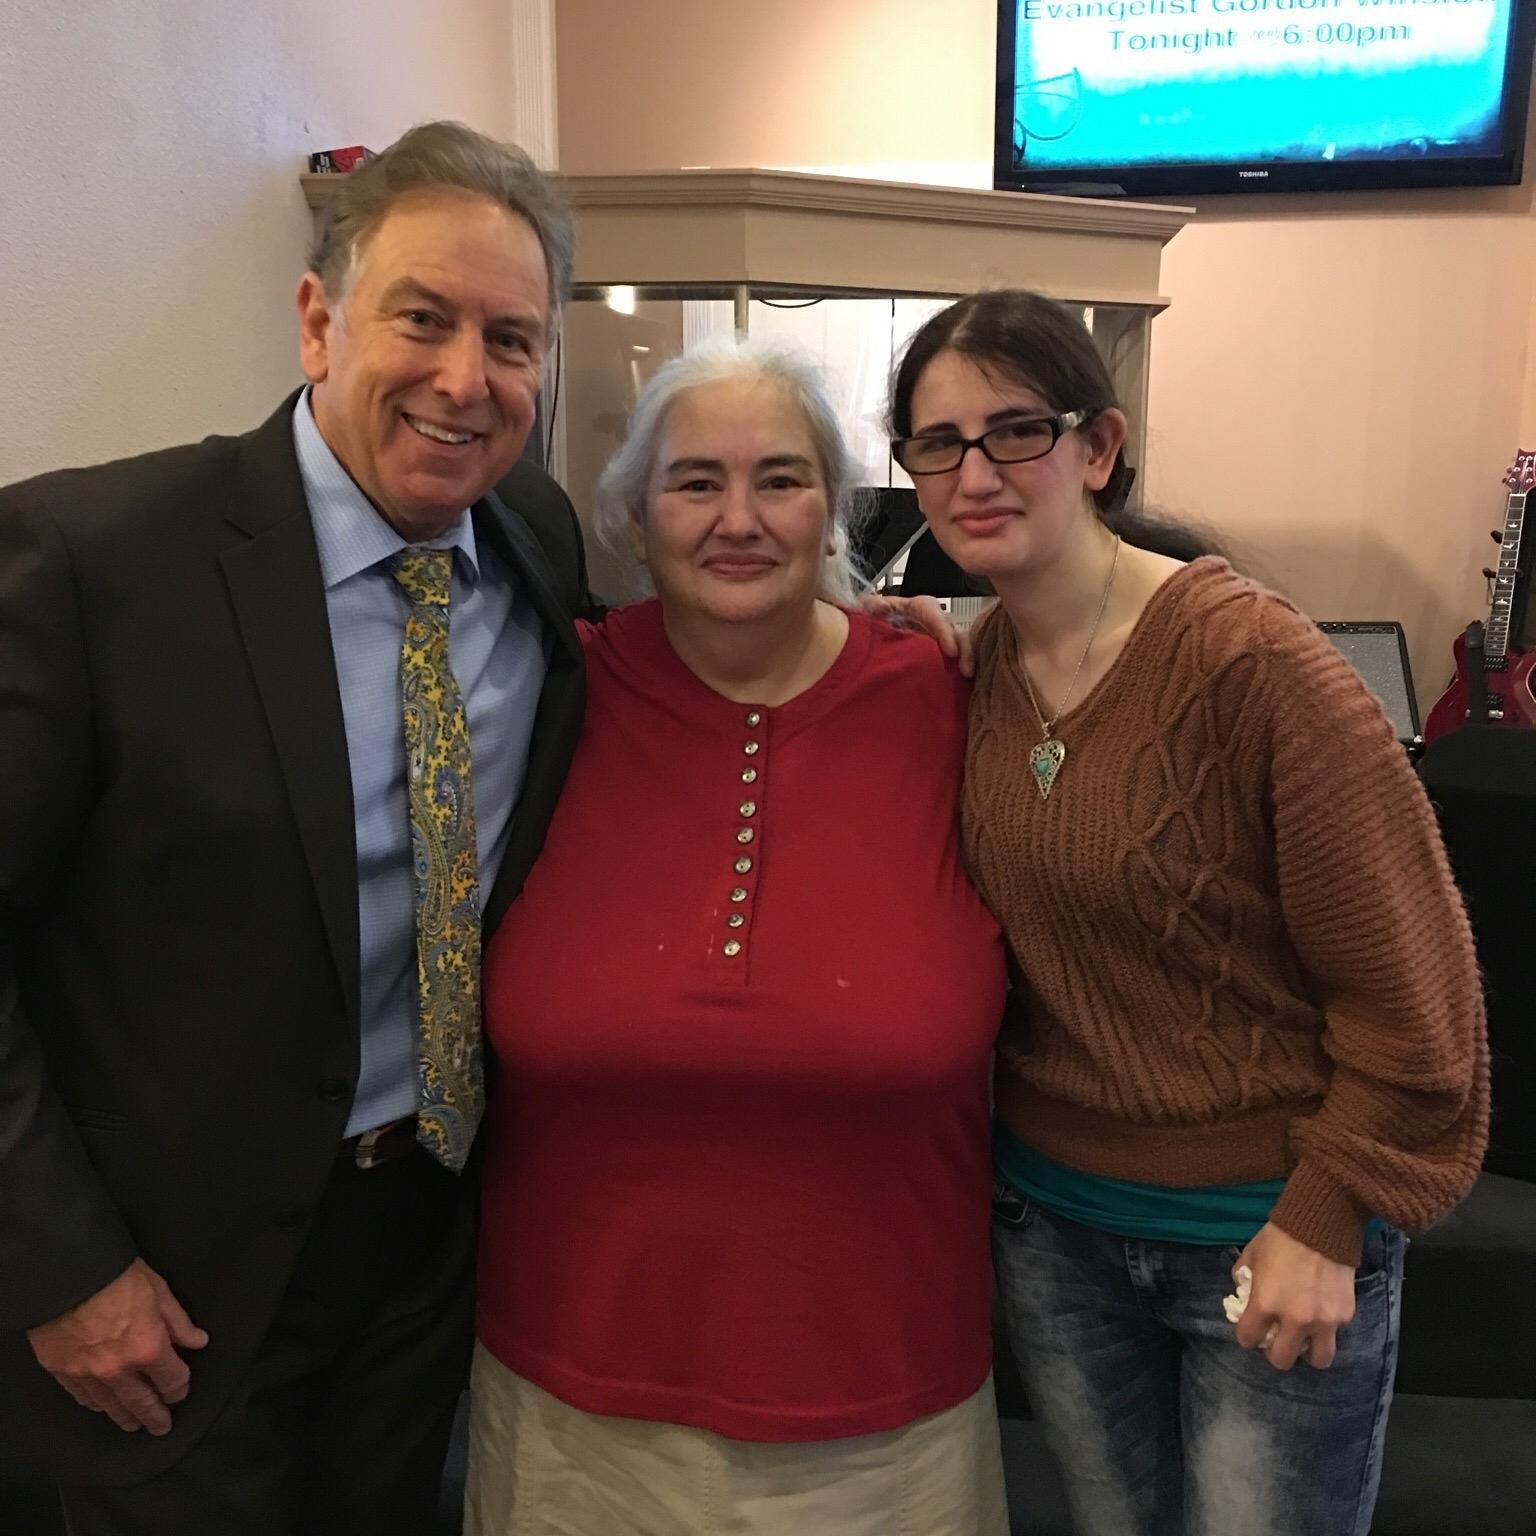 Louisiana; Woman healed of using a cane.